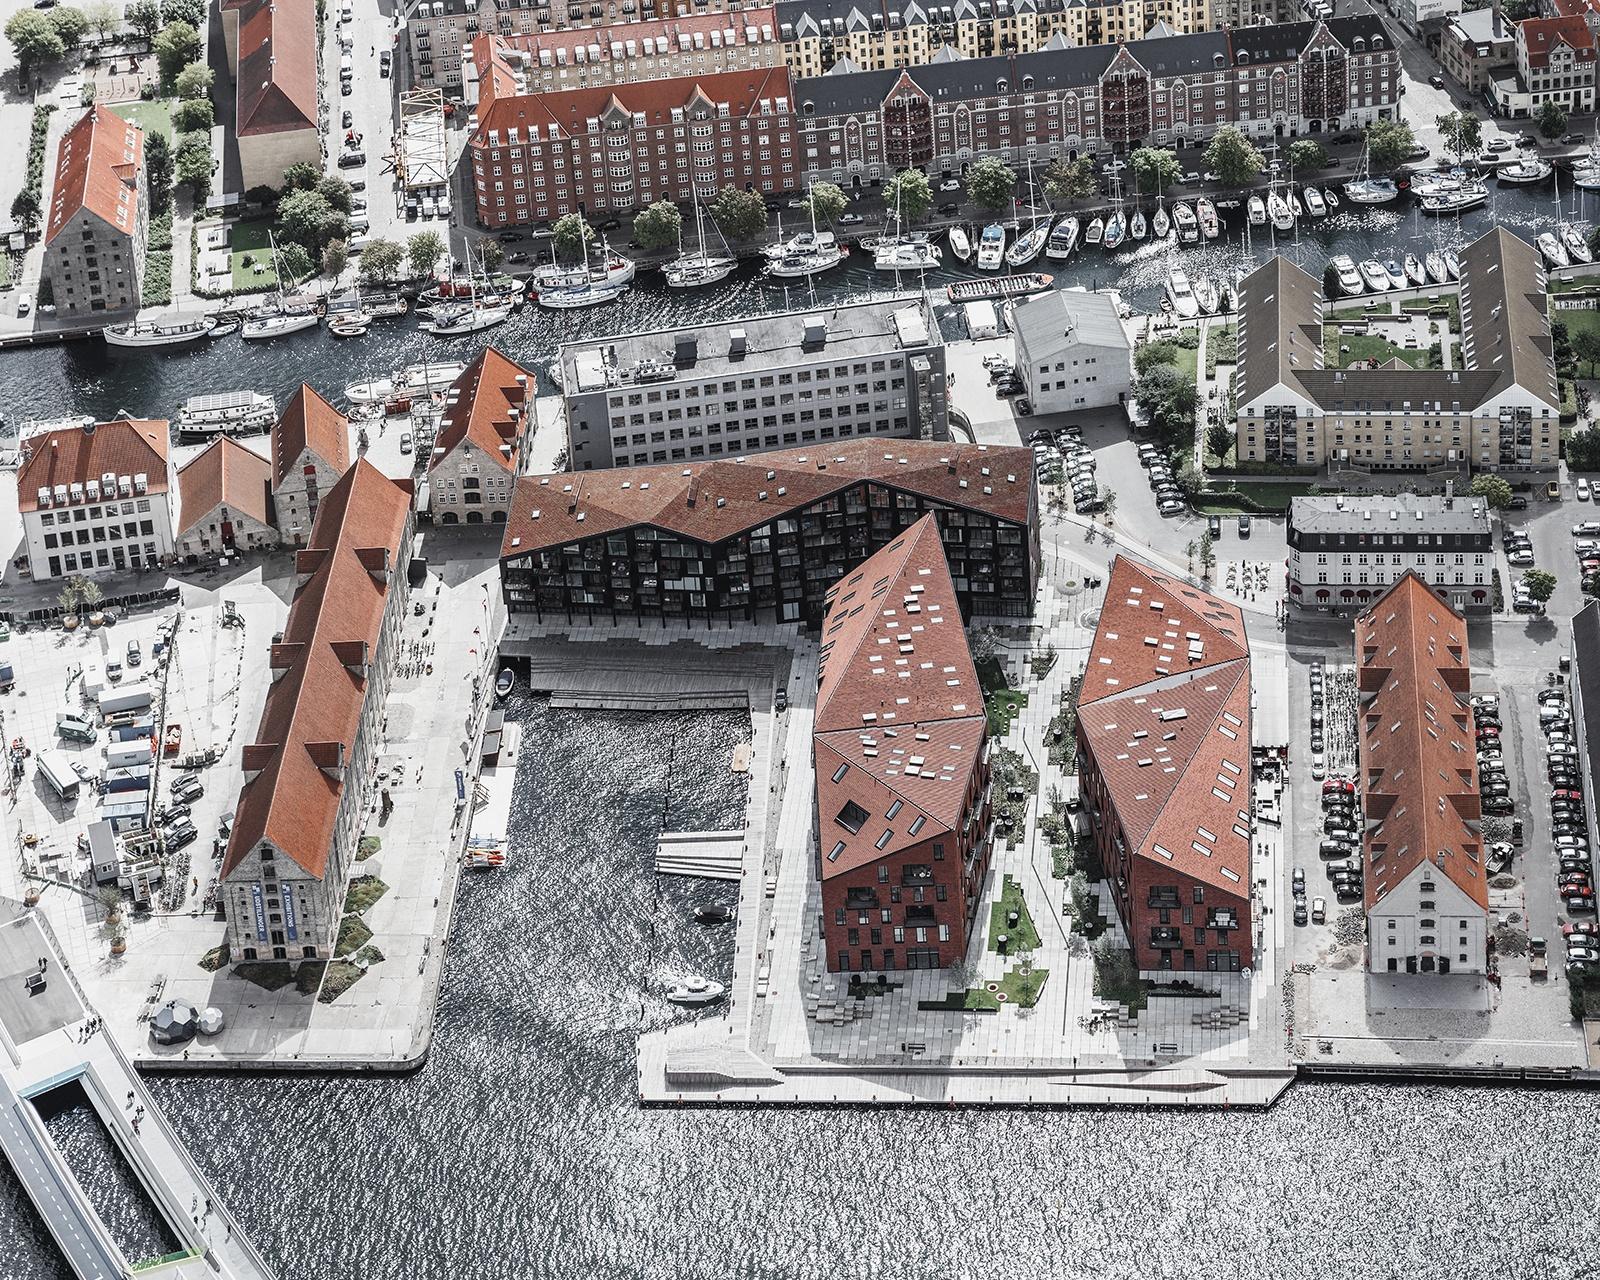 1 Rasmus Hjortshoj - Kroyers Plads PRINT-100-1600